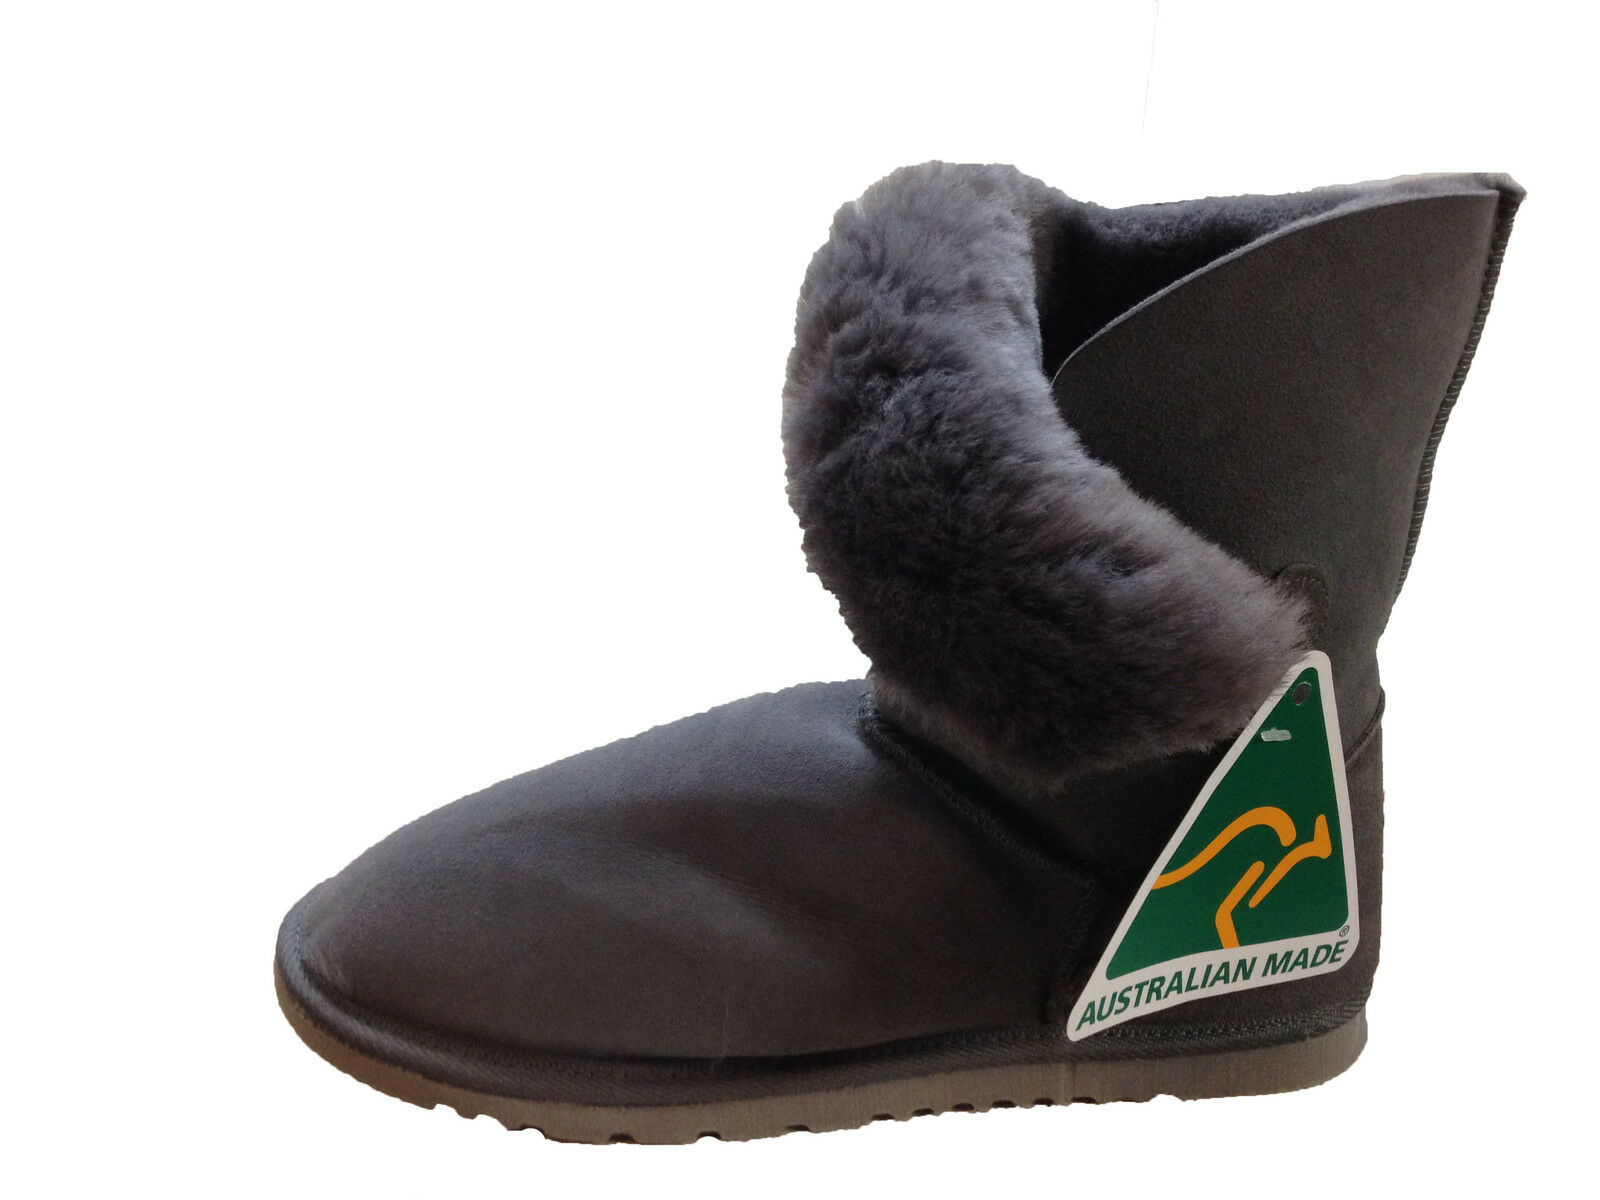 c8f3ed92fee8 Australian Made Genuine Sheepskin Lady Grå Genuine s One Button UGG Lady  Boots Grå färg